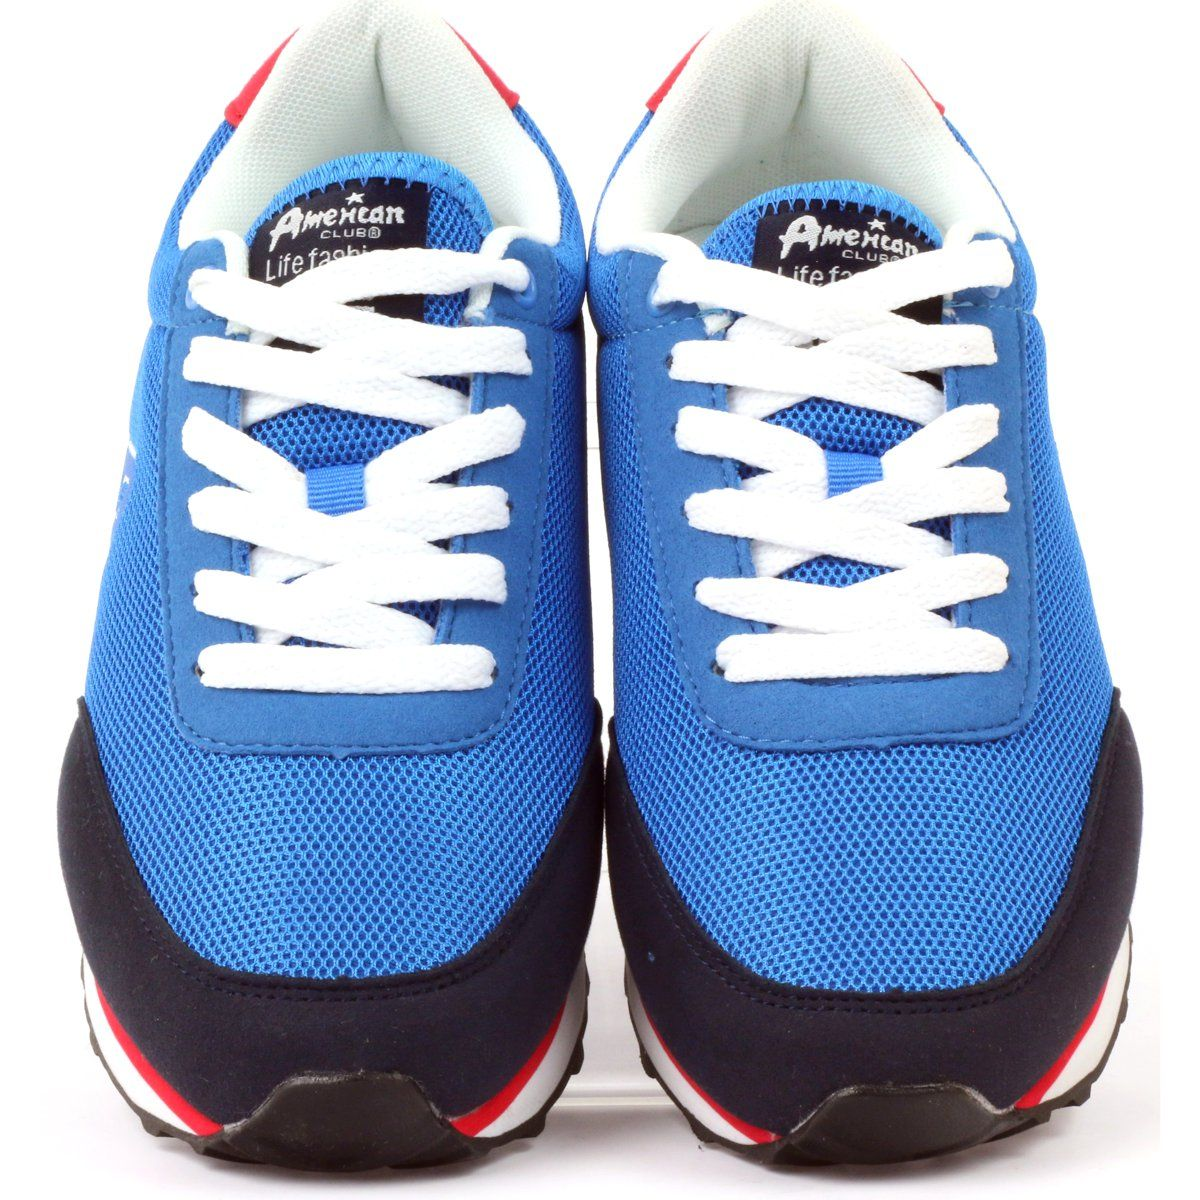 American Club Buty Sportowe Wiazane American Niebieskie Sports Shoes Shoes Club Heels